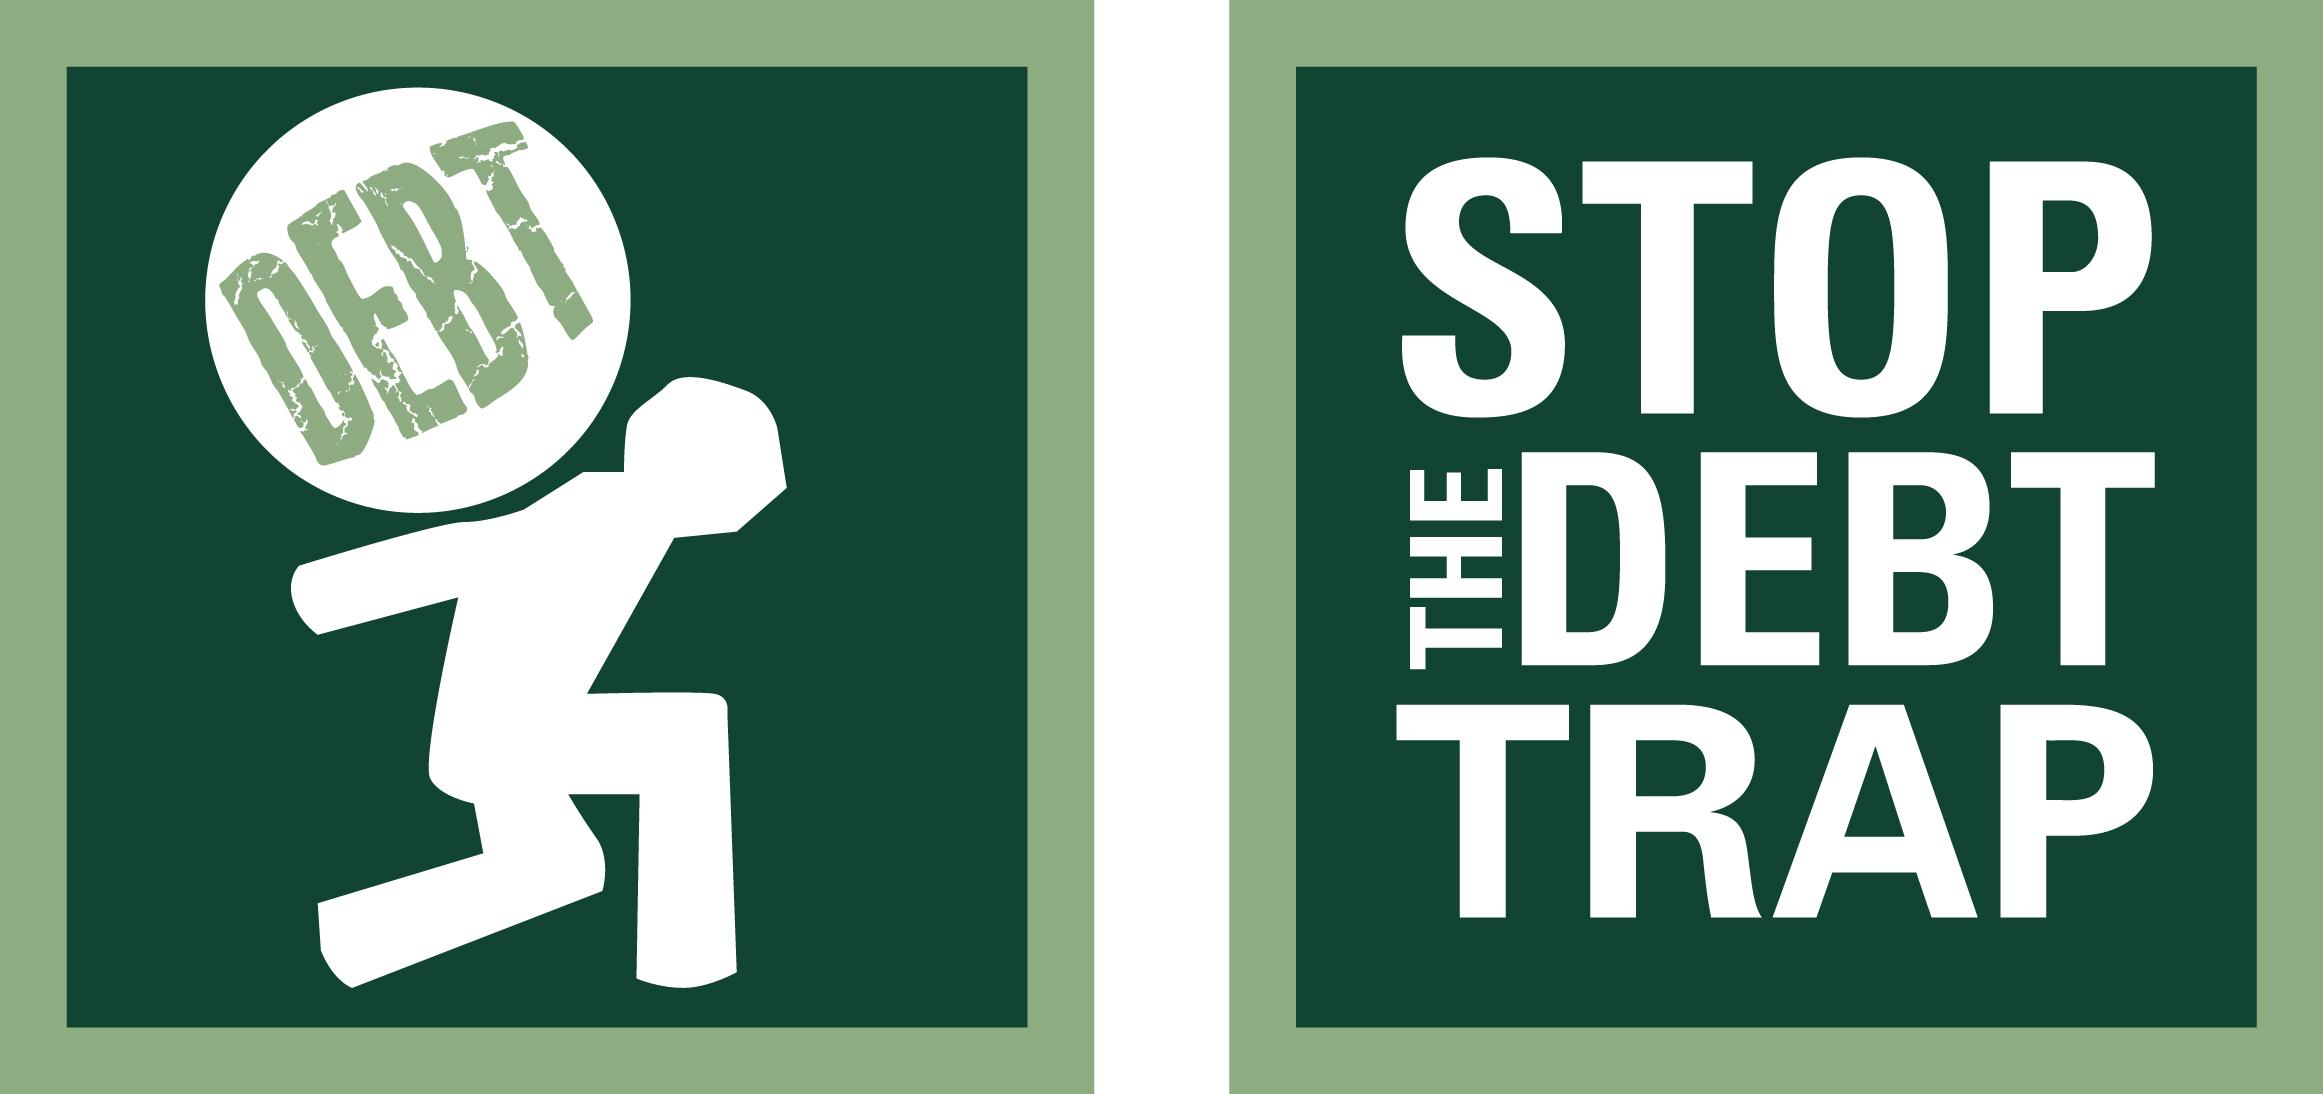 Debt_Trap_Logo_combined.jpg